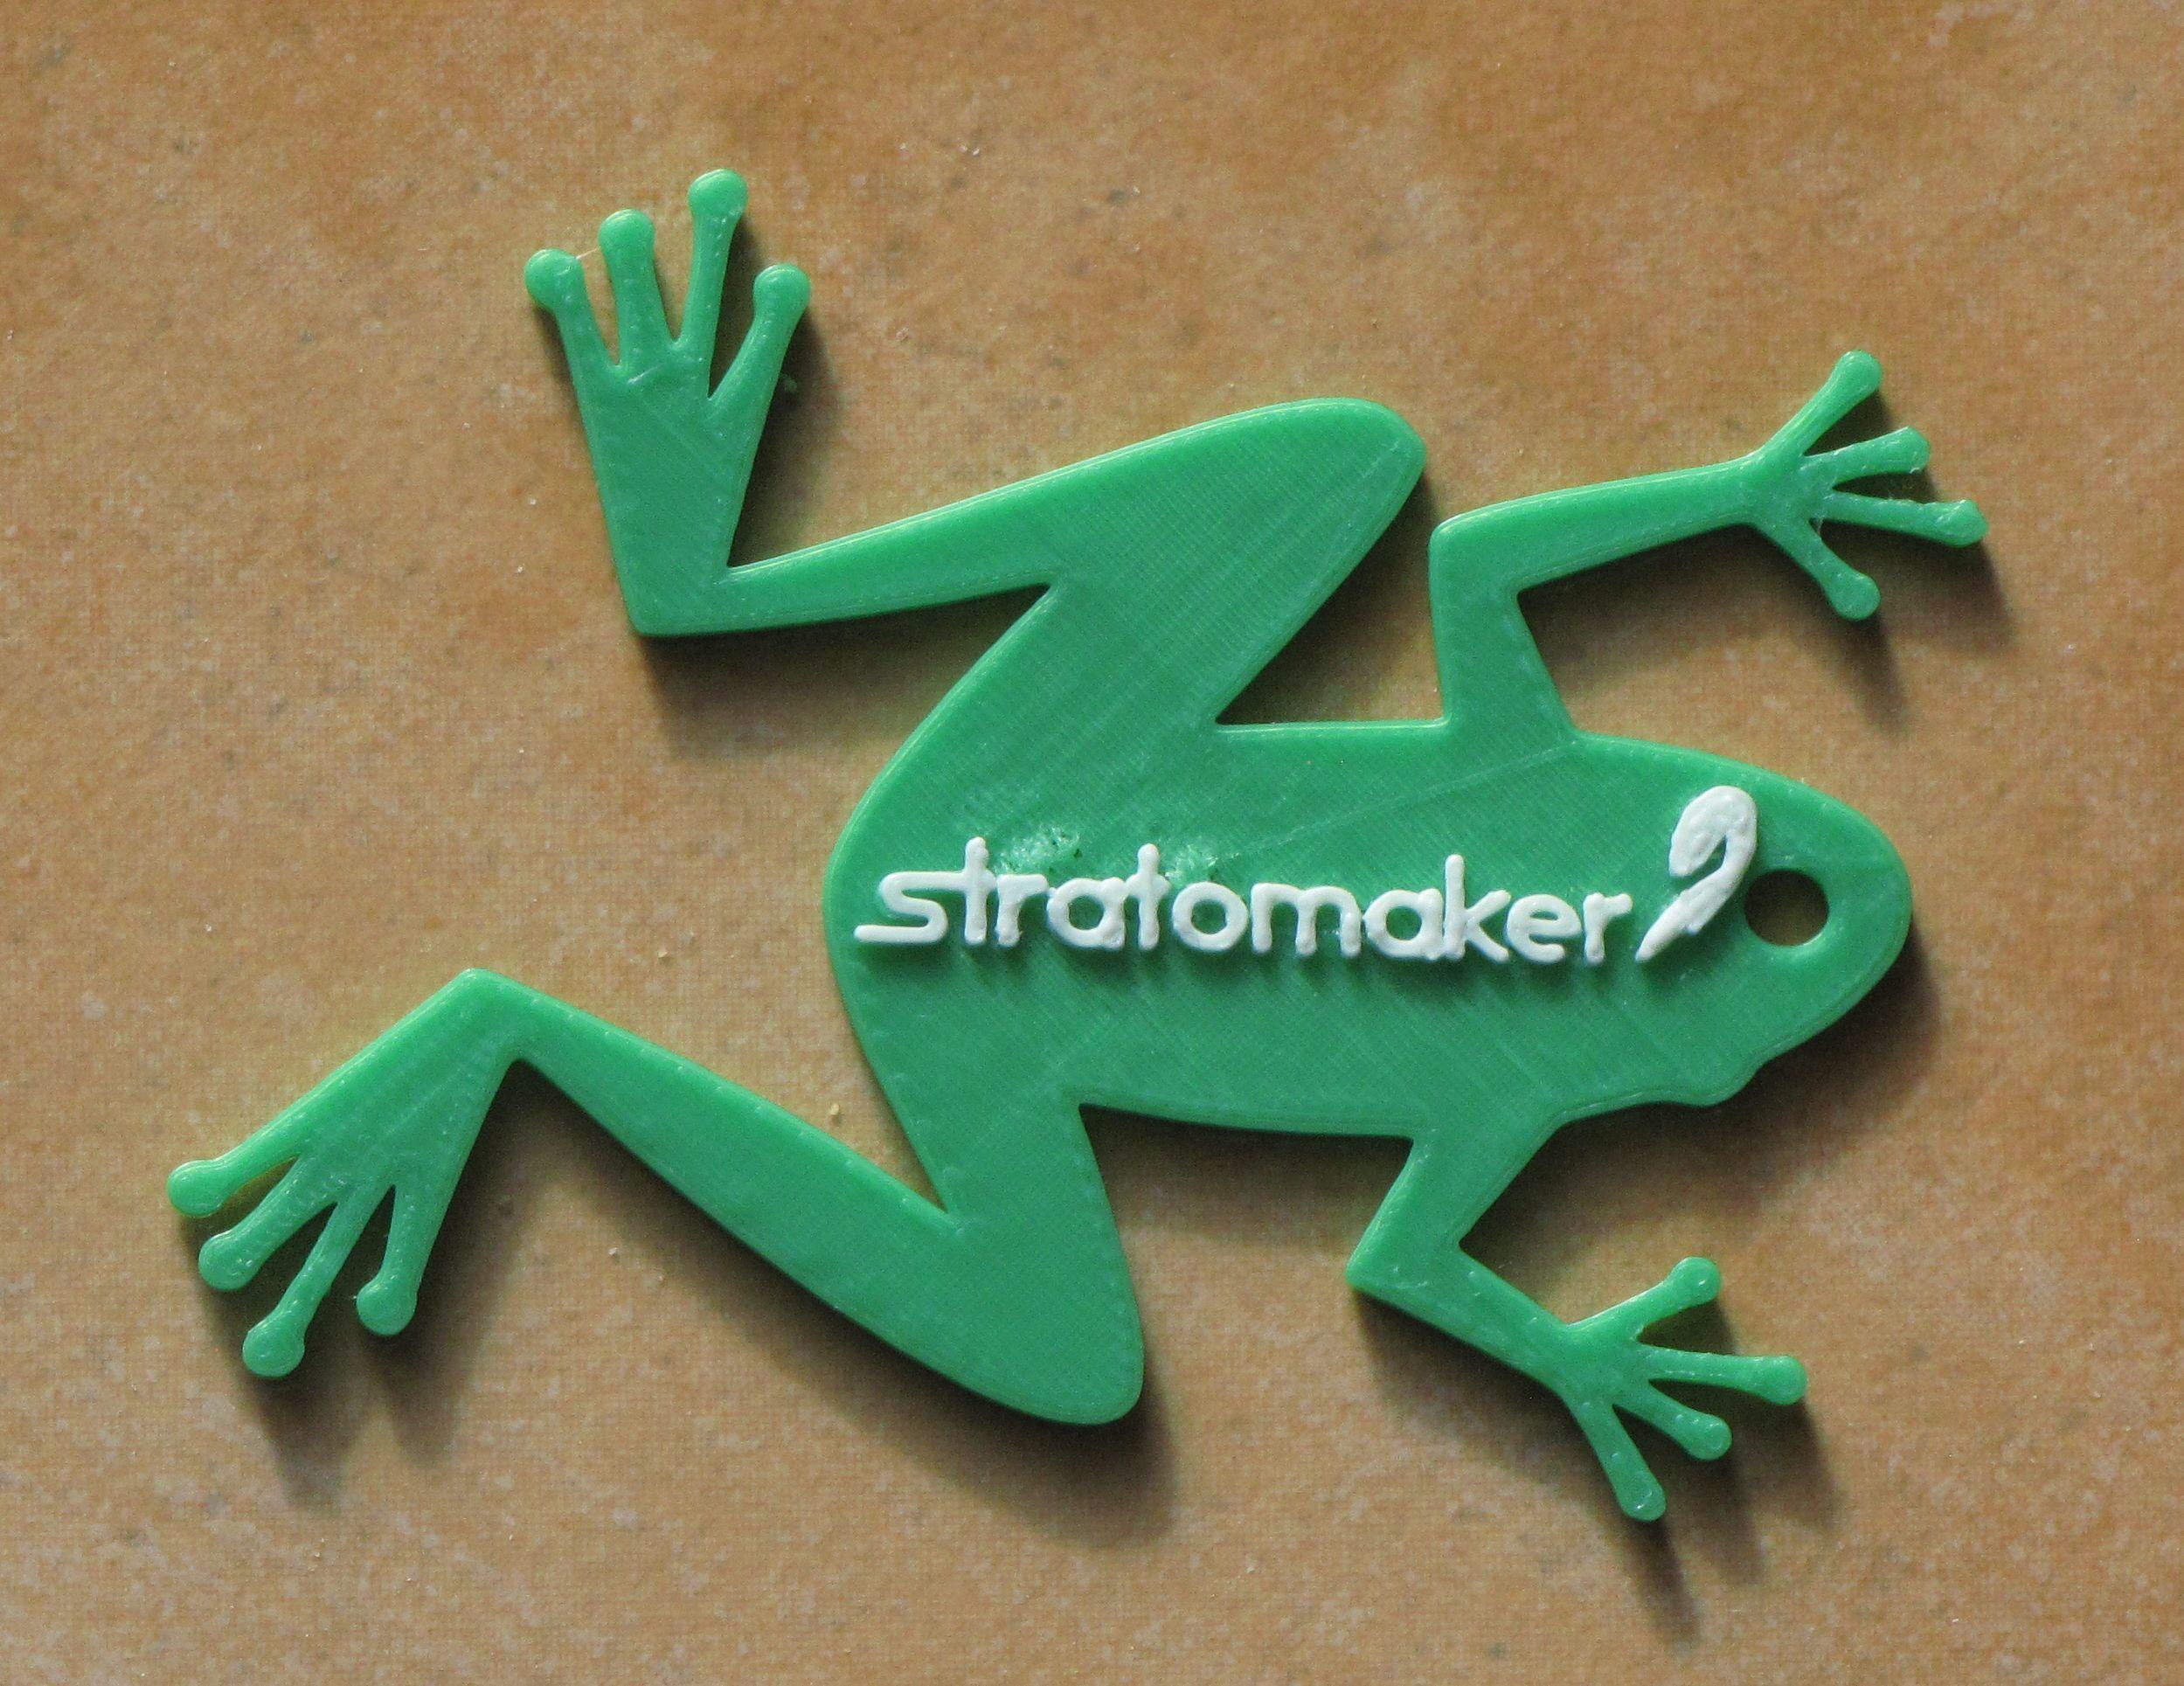 Stratomaker Grenouille.jpg Download free STL file GrenouilleSTRATOMAKER • 3D printer template, dopy